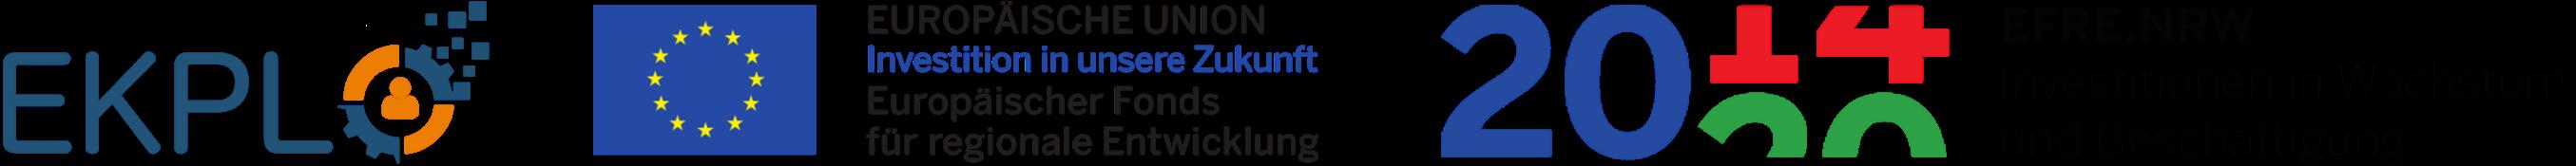 logos_gemeinsam